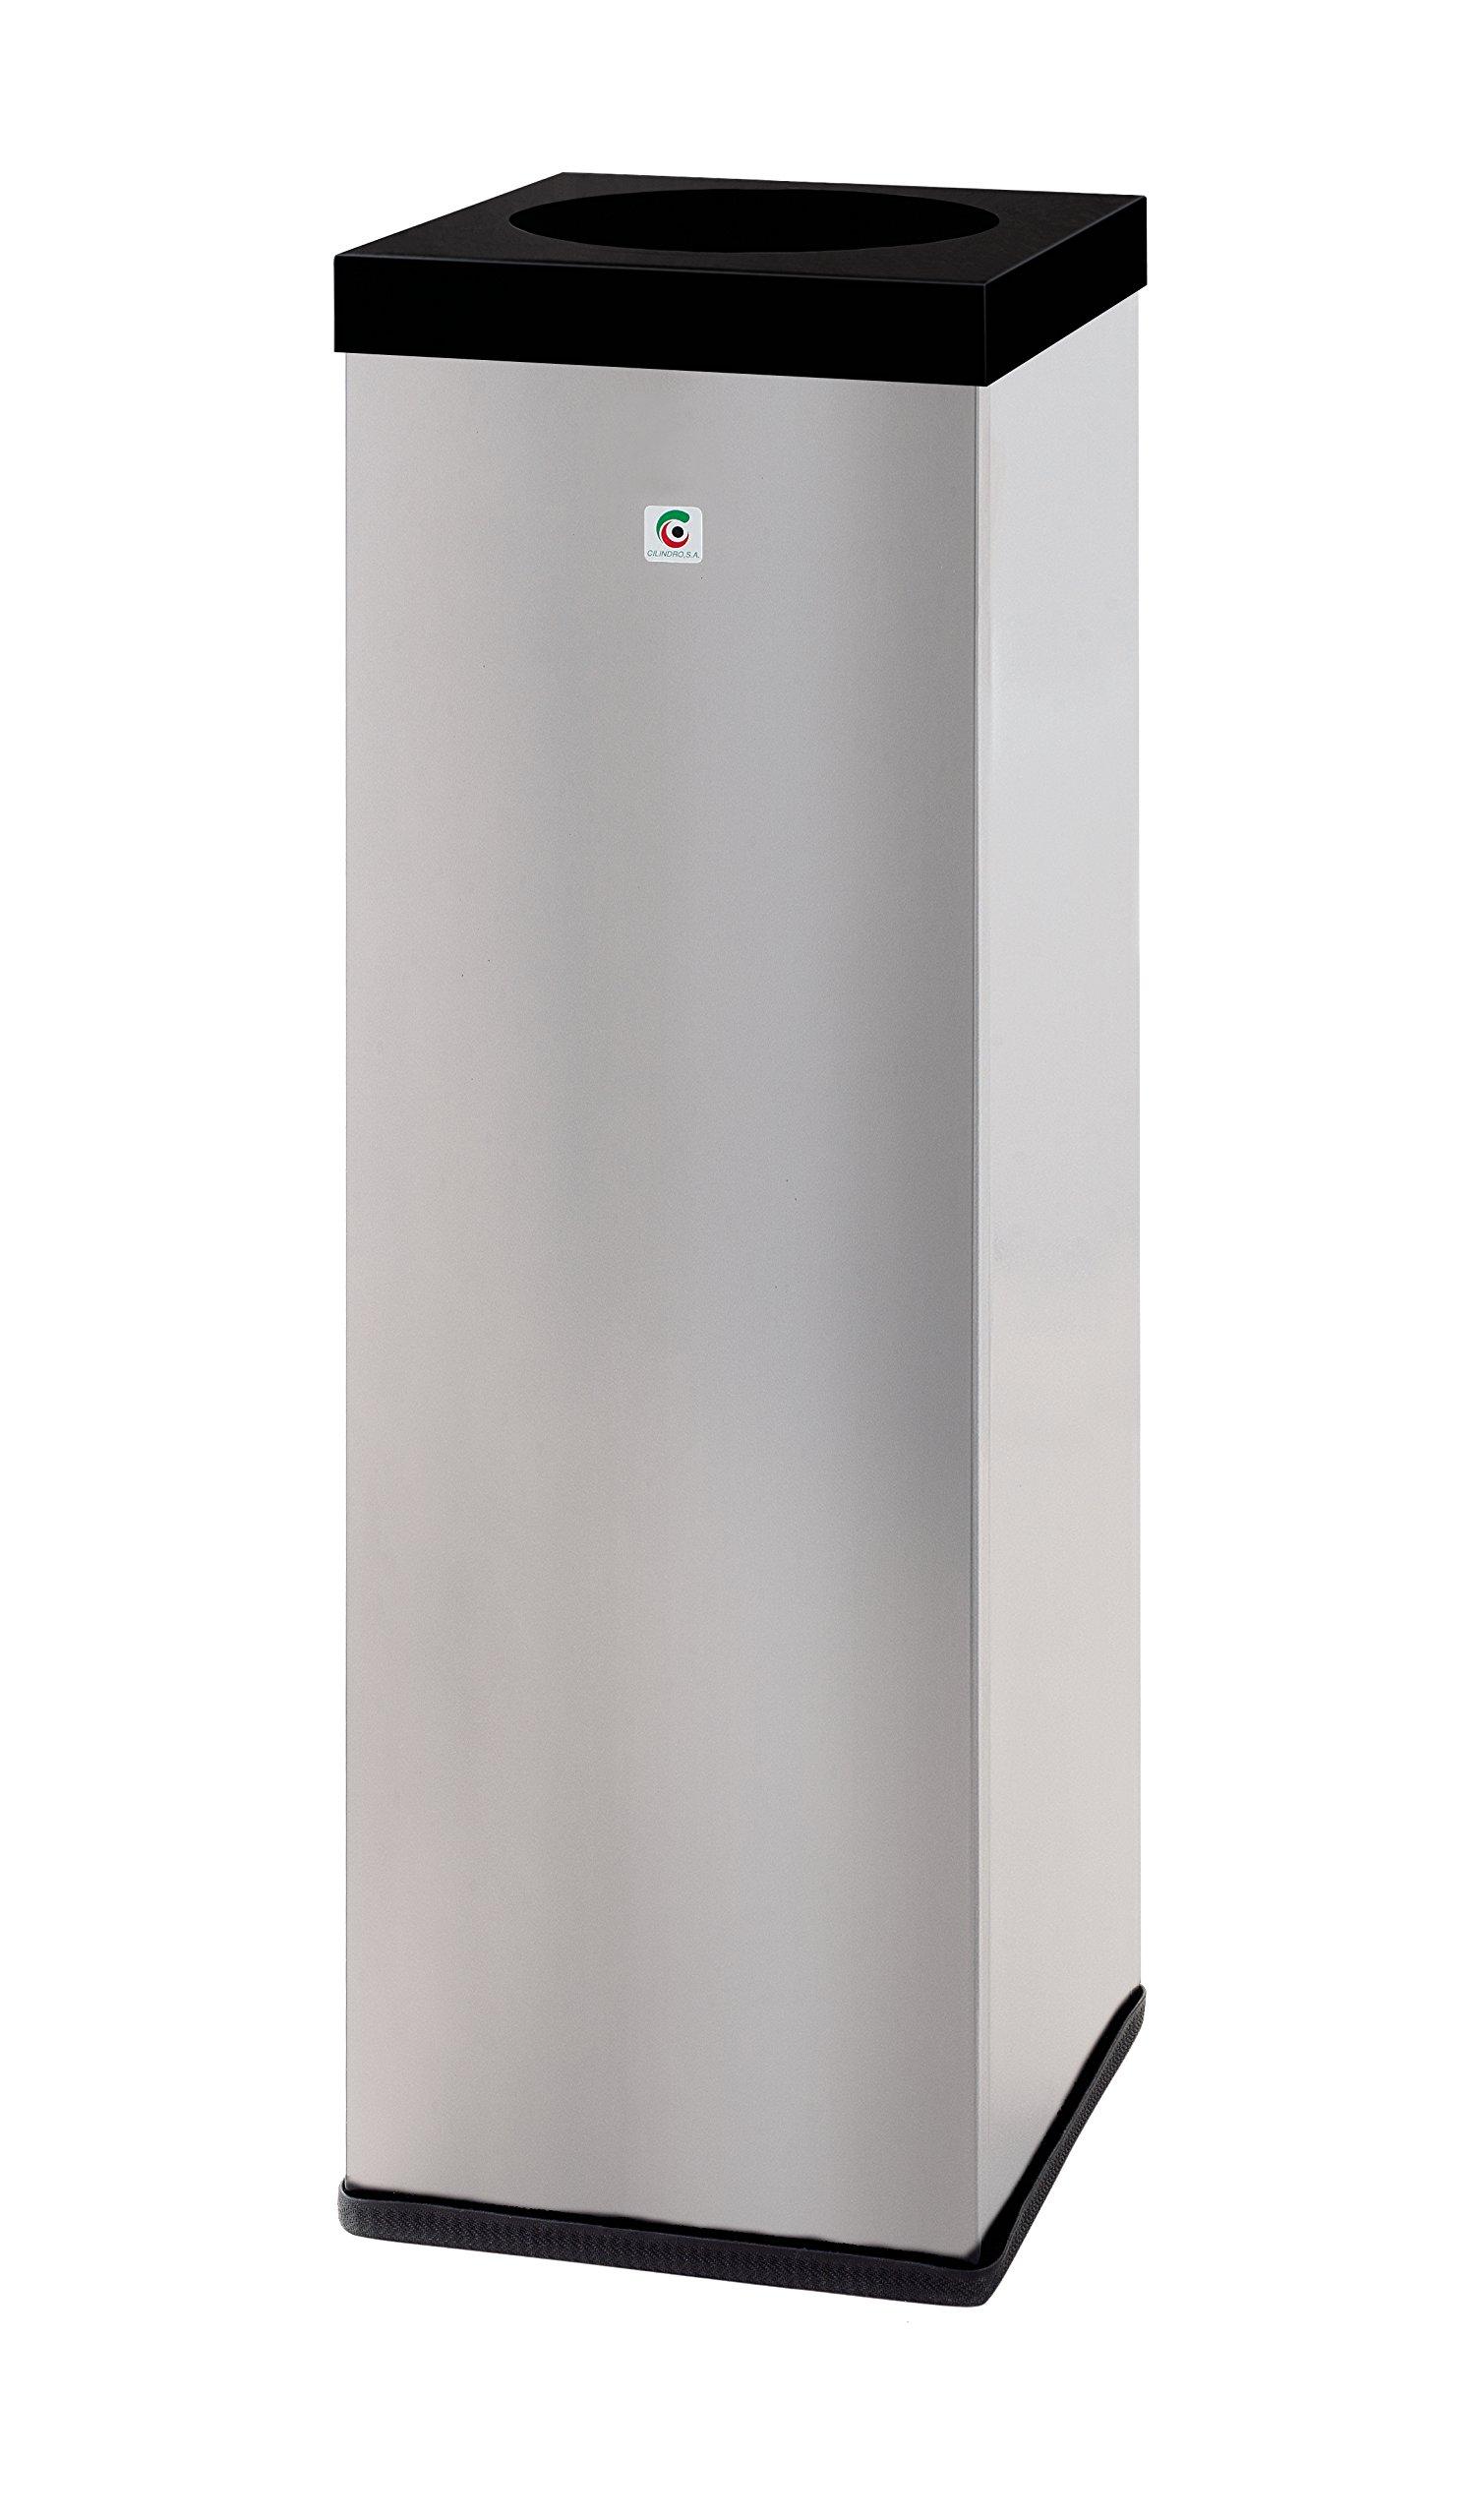 Cylinder P-719006Bin, Metal, Grey, 70x 22x 22cm